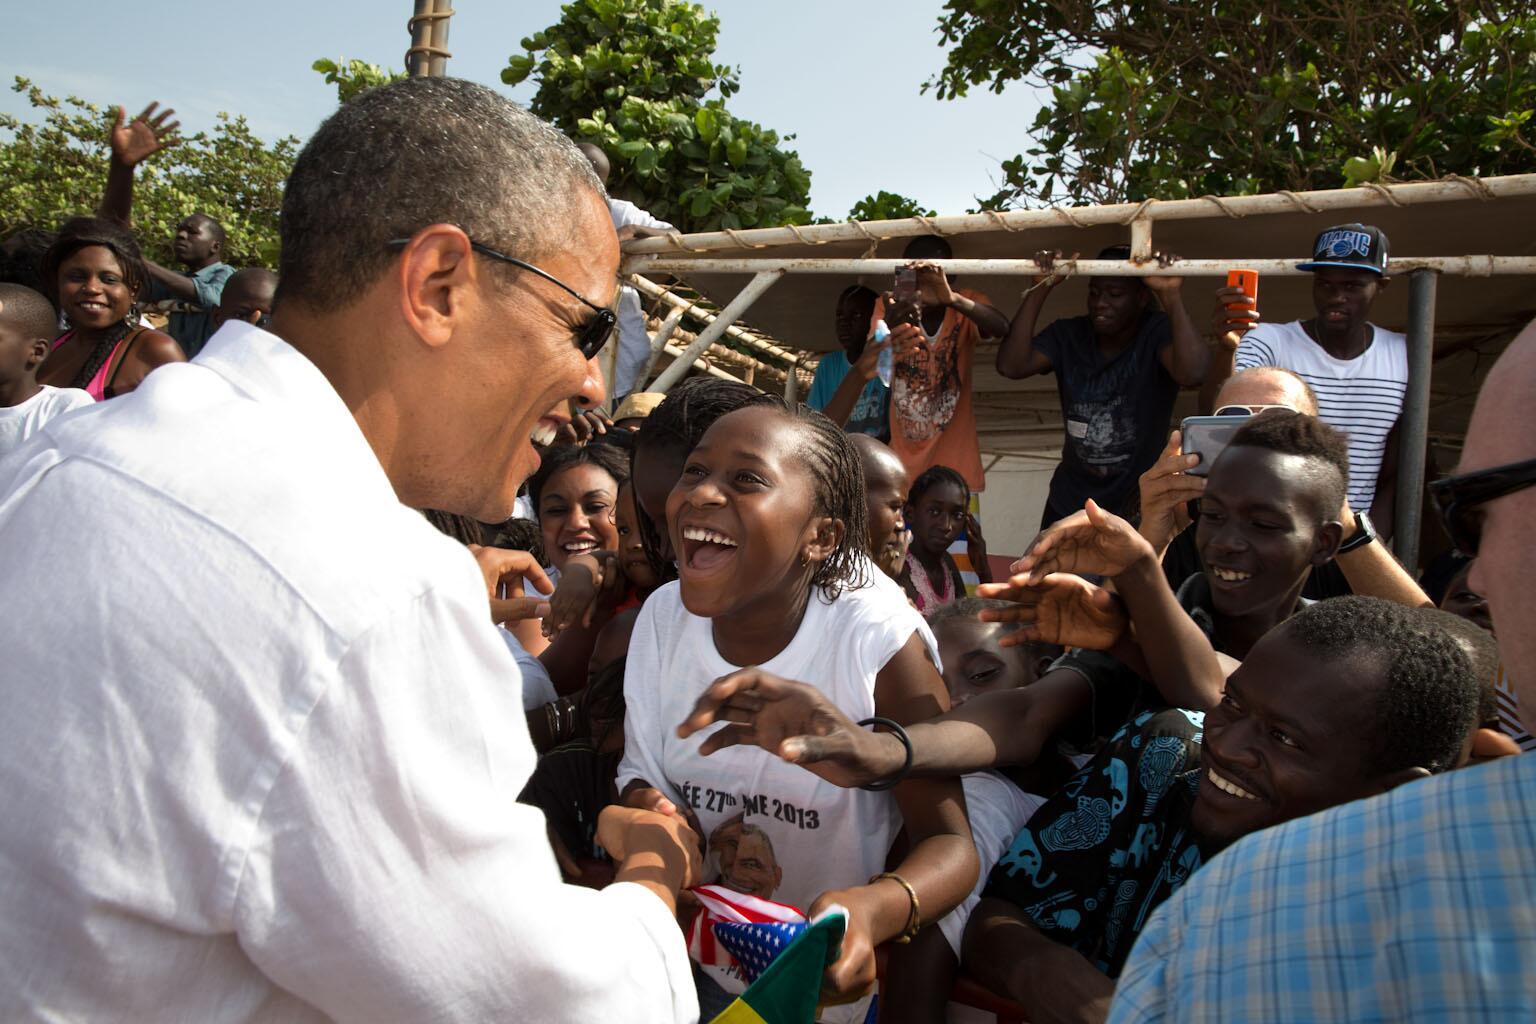 President Obama greets kids on Gorée Island in Senegal: http://t.co/Vx7NevnMnA